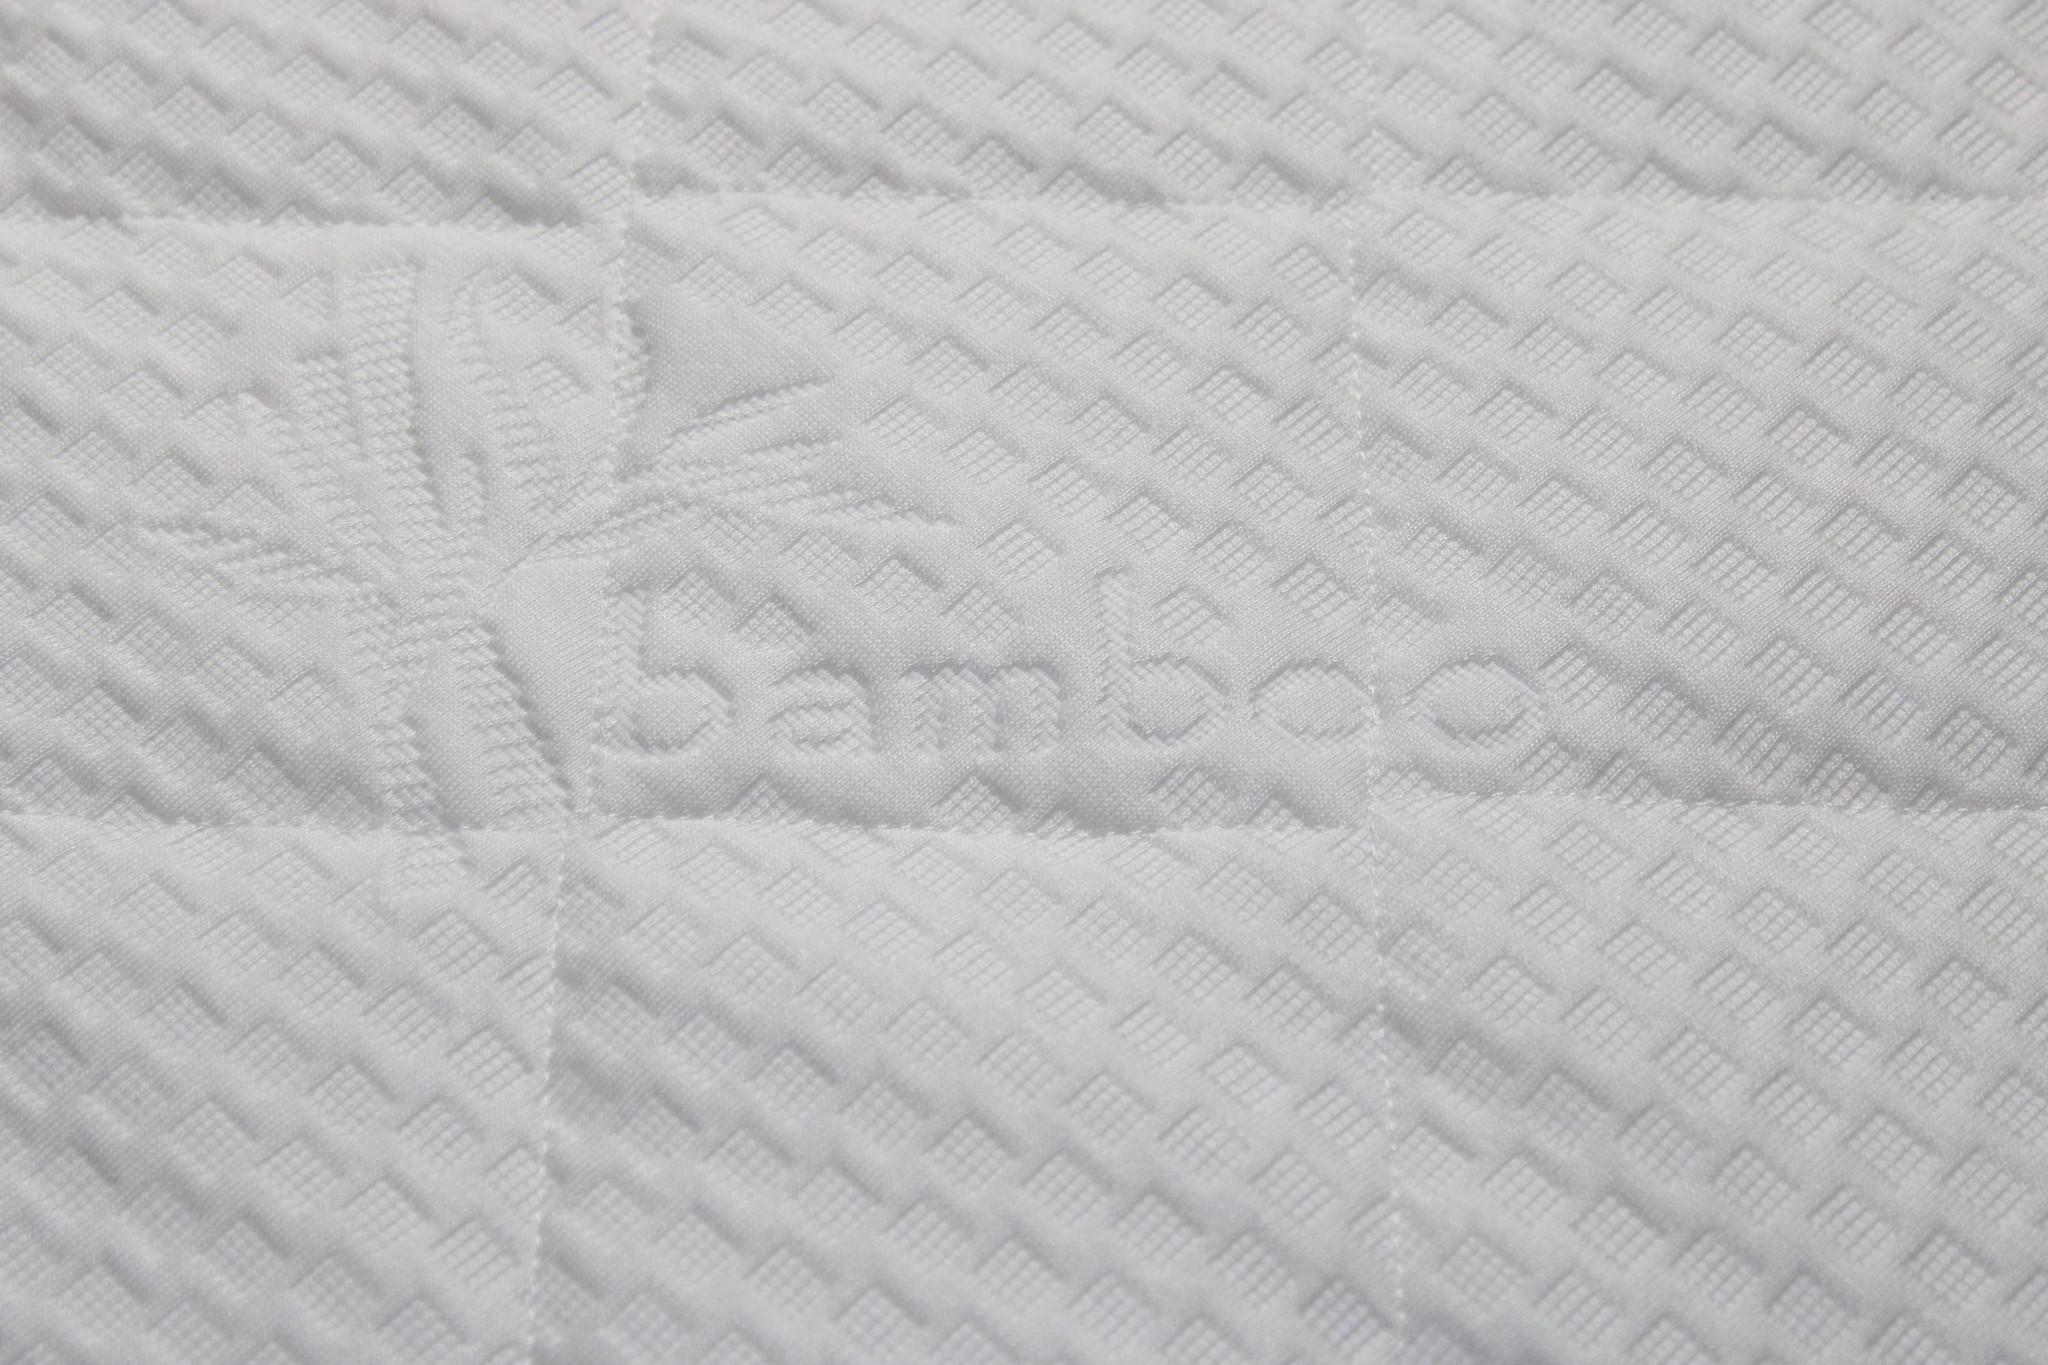 Sarpy Kindermatras 80x185 koudschuim HR55 bamboo